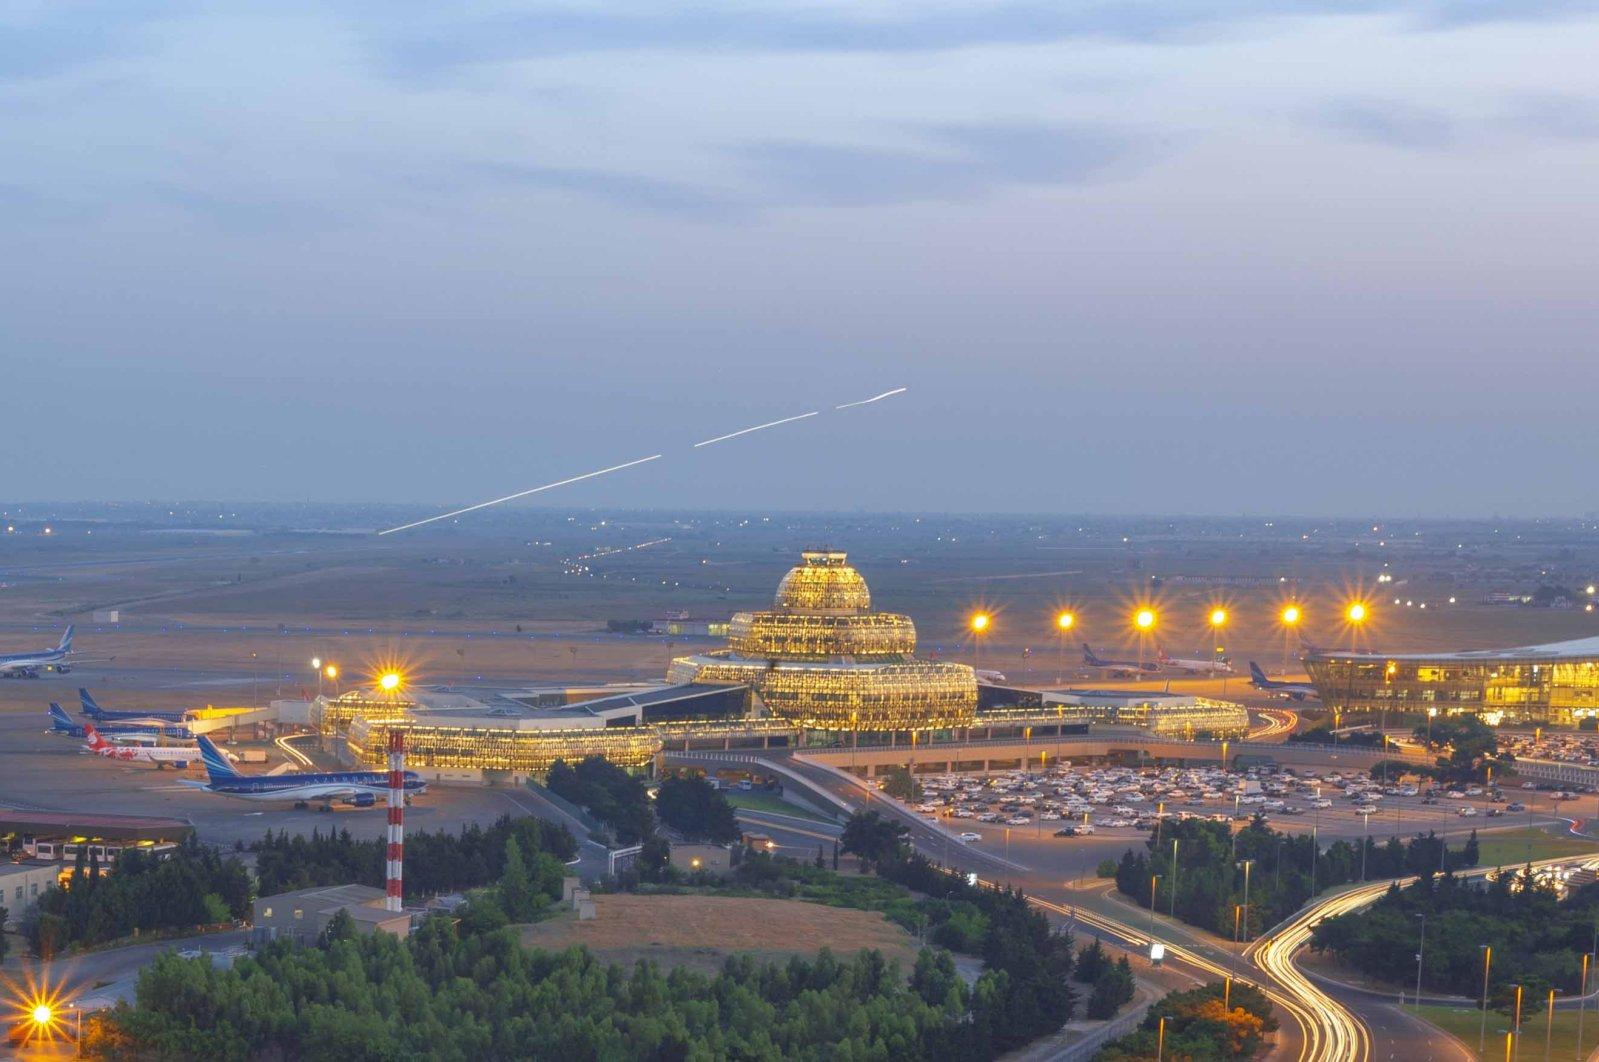 Baku International Airport (Photo by @BakuAirport Twitter)